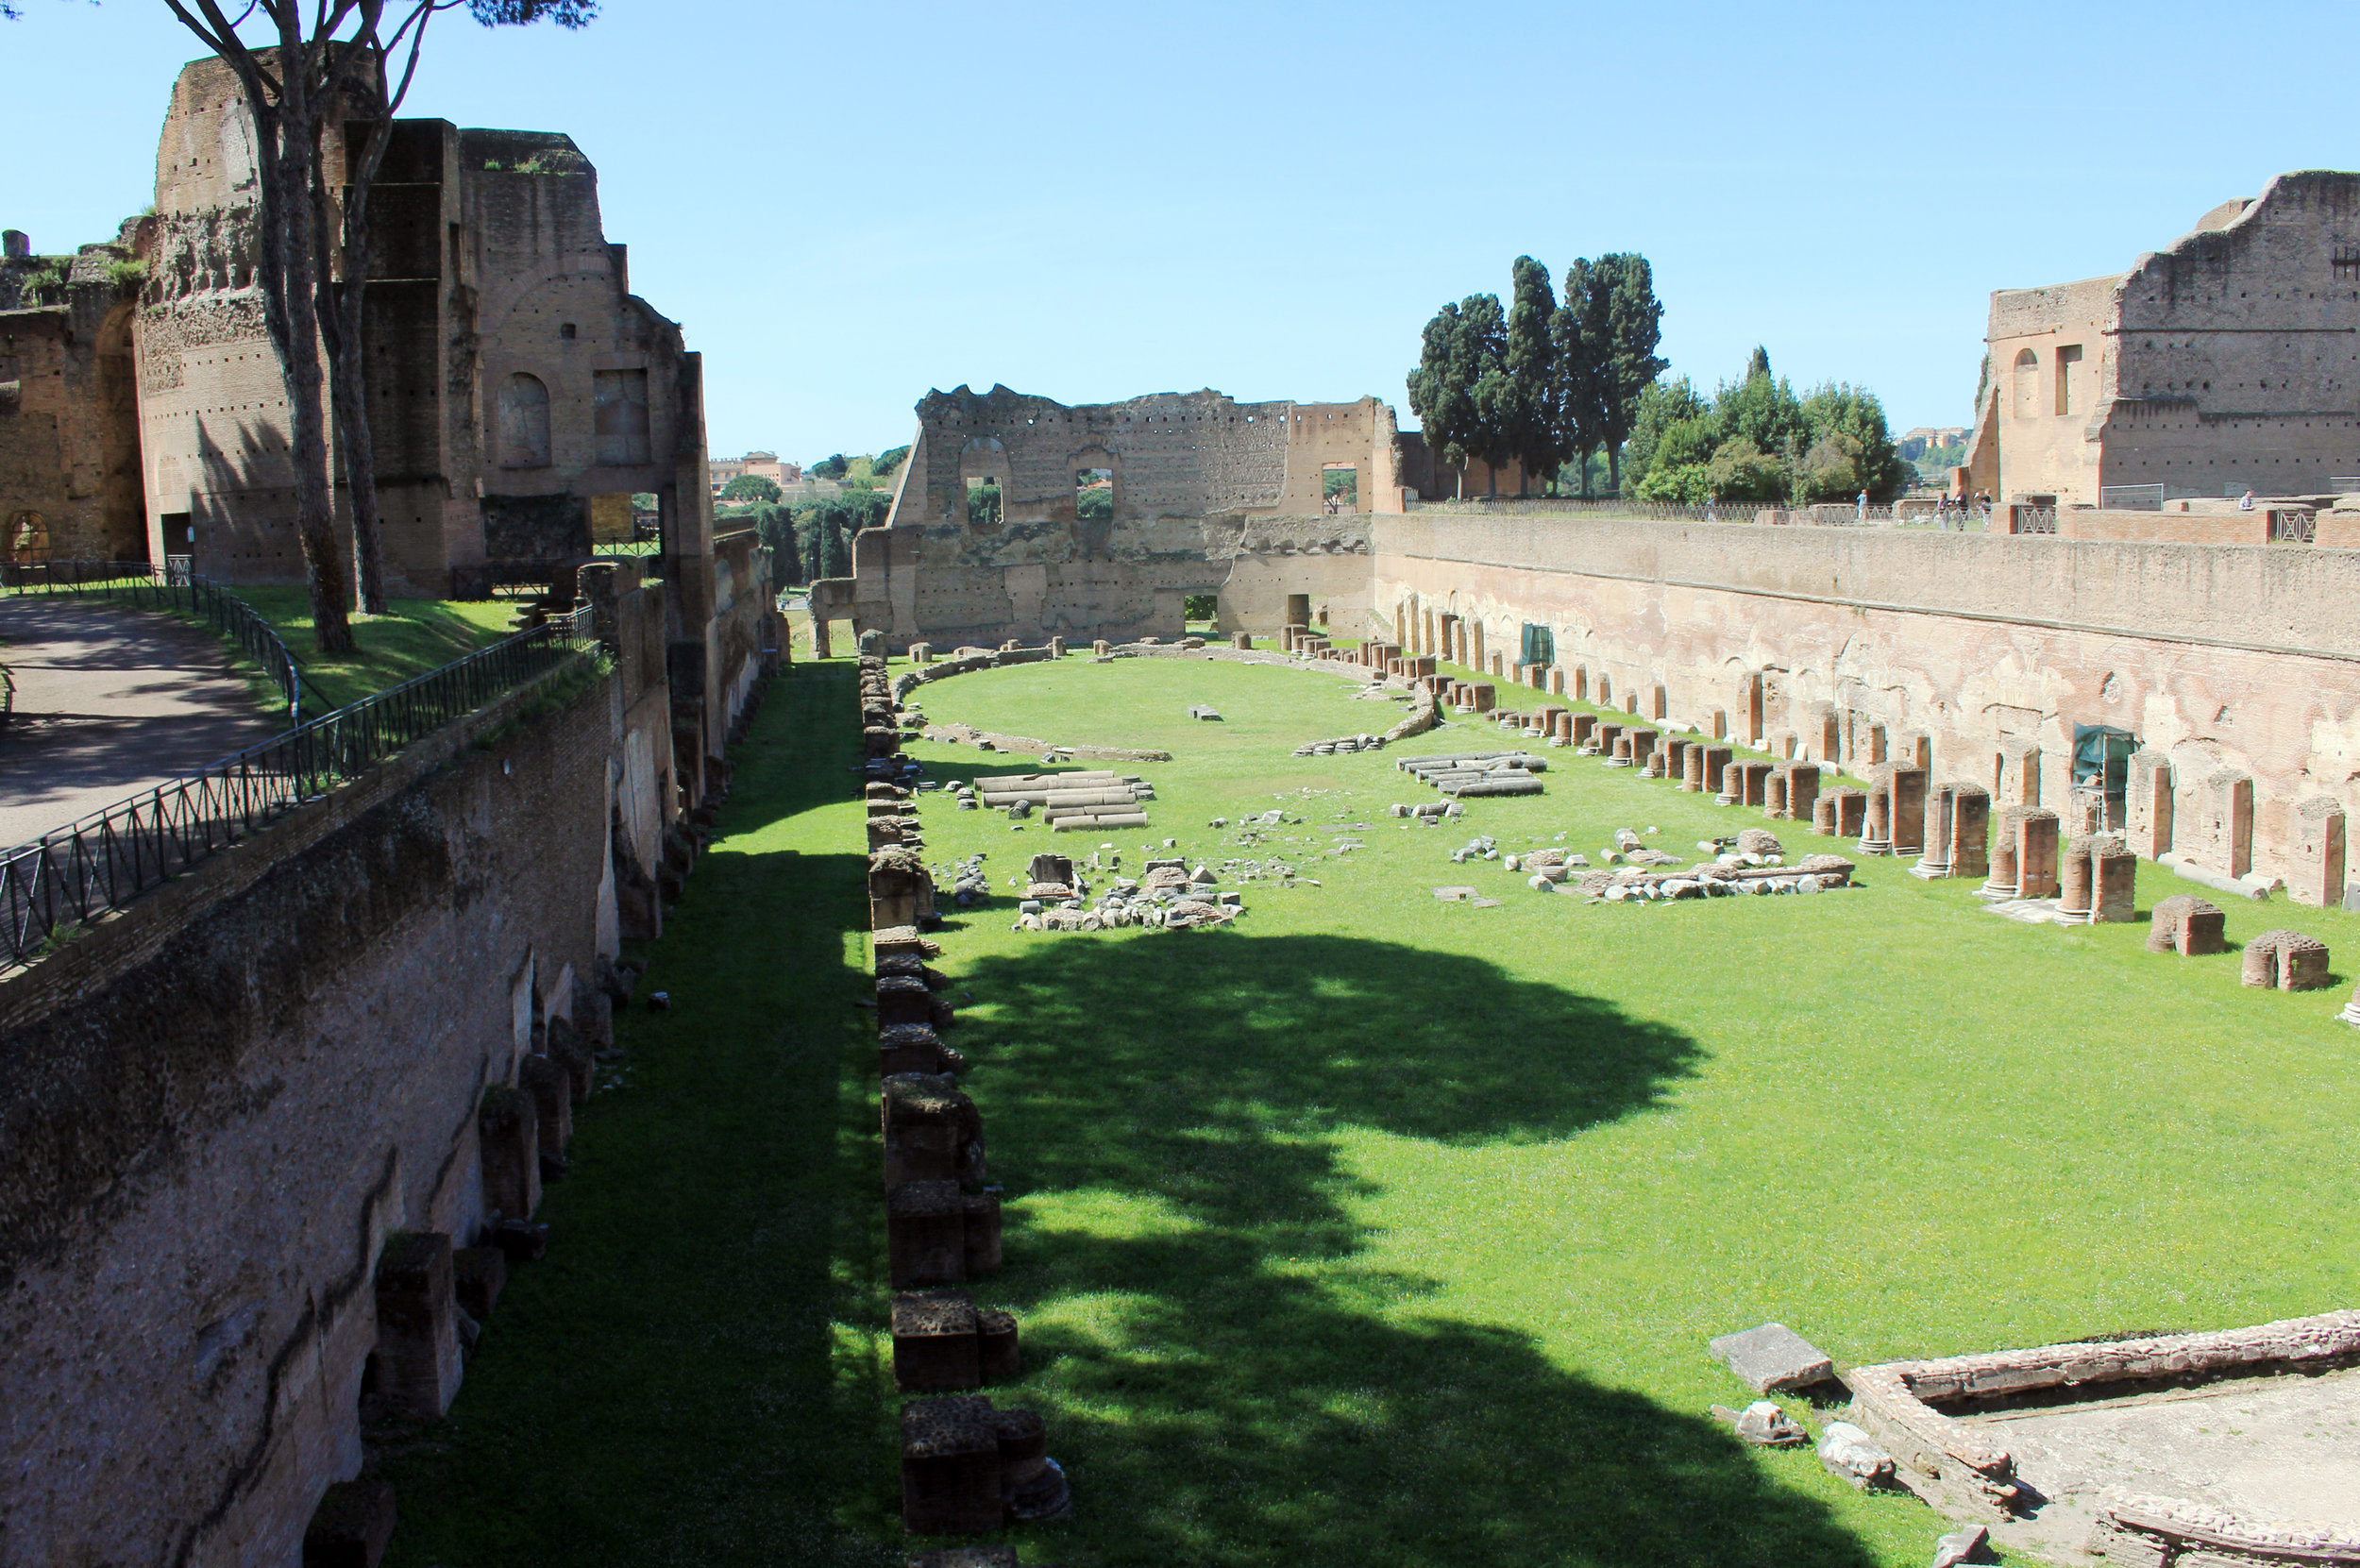 Stadium of Domitianus (part of the palatine hill).Source: Wikimedia